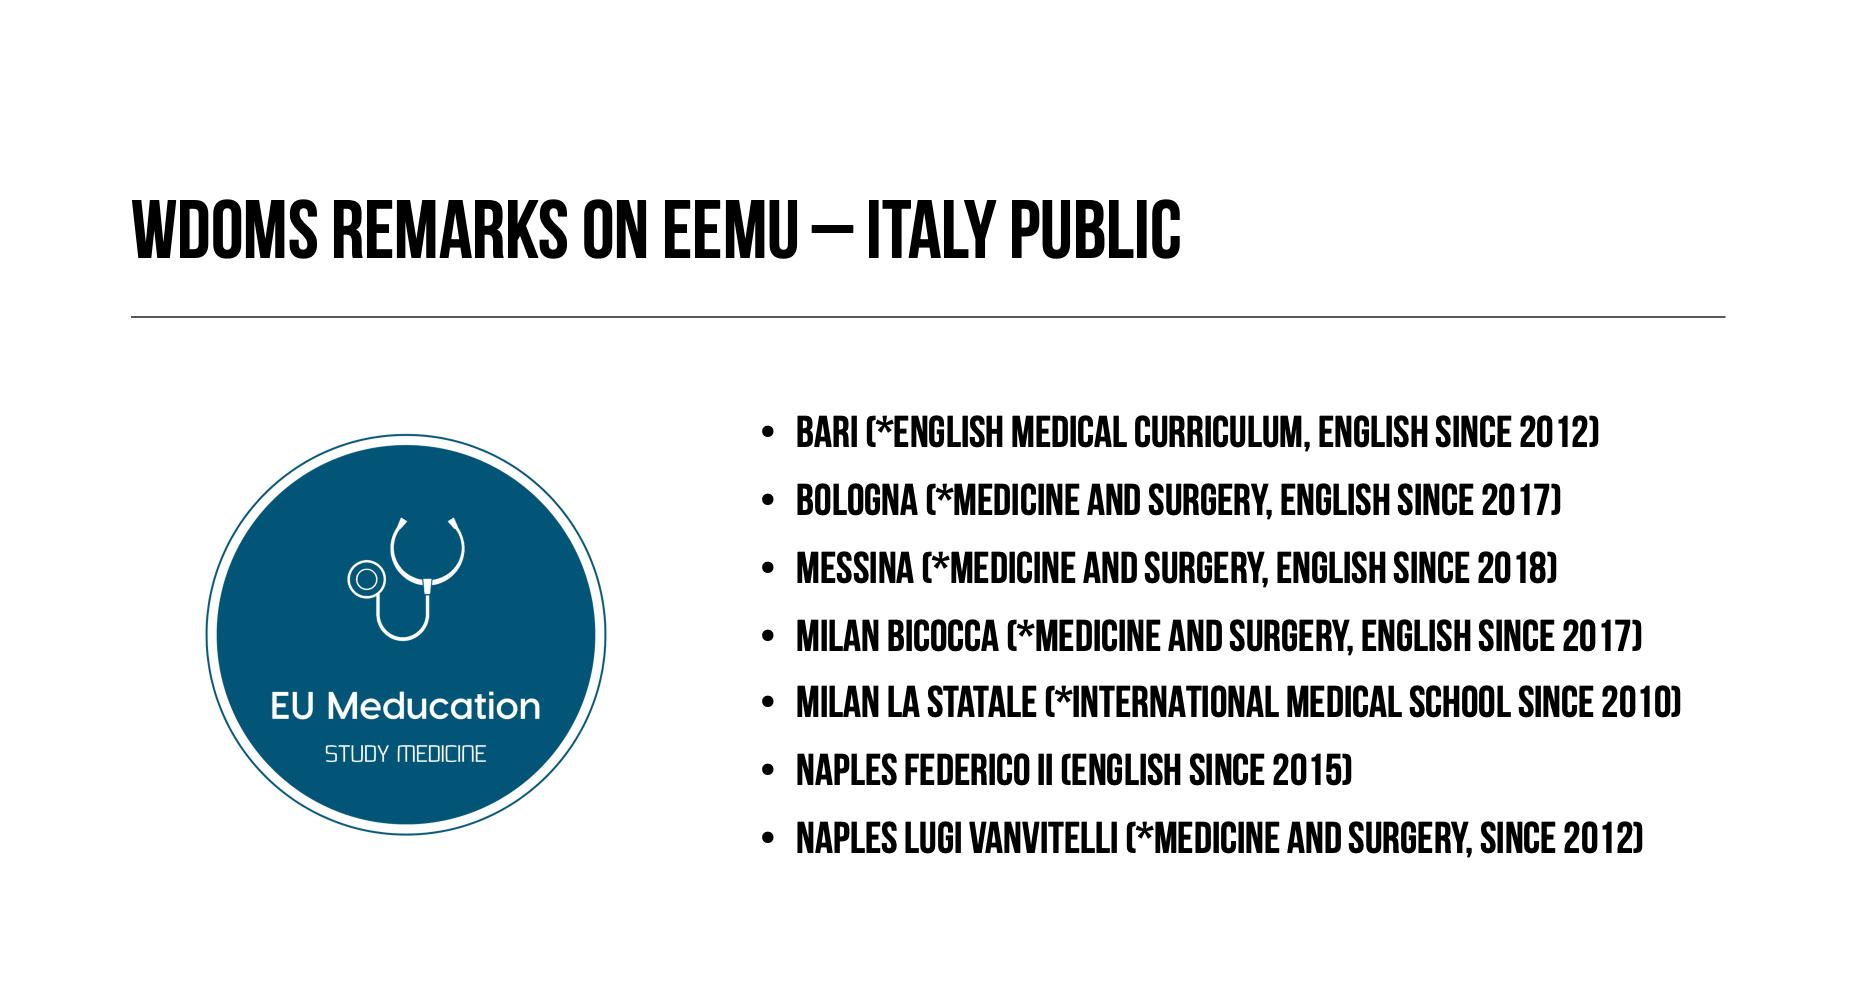 WDOMS-Italy-Public-1